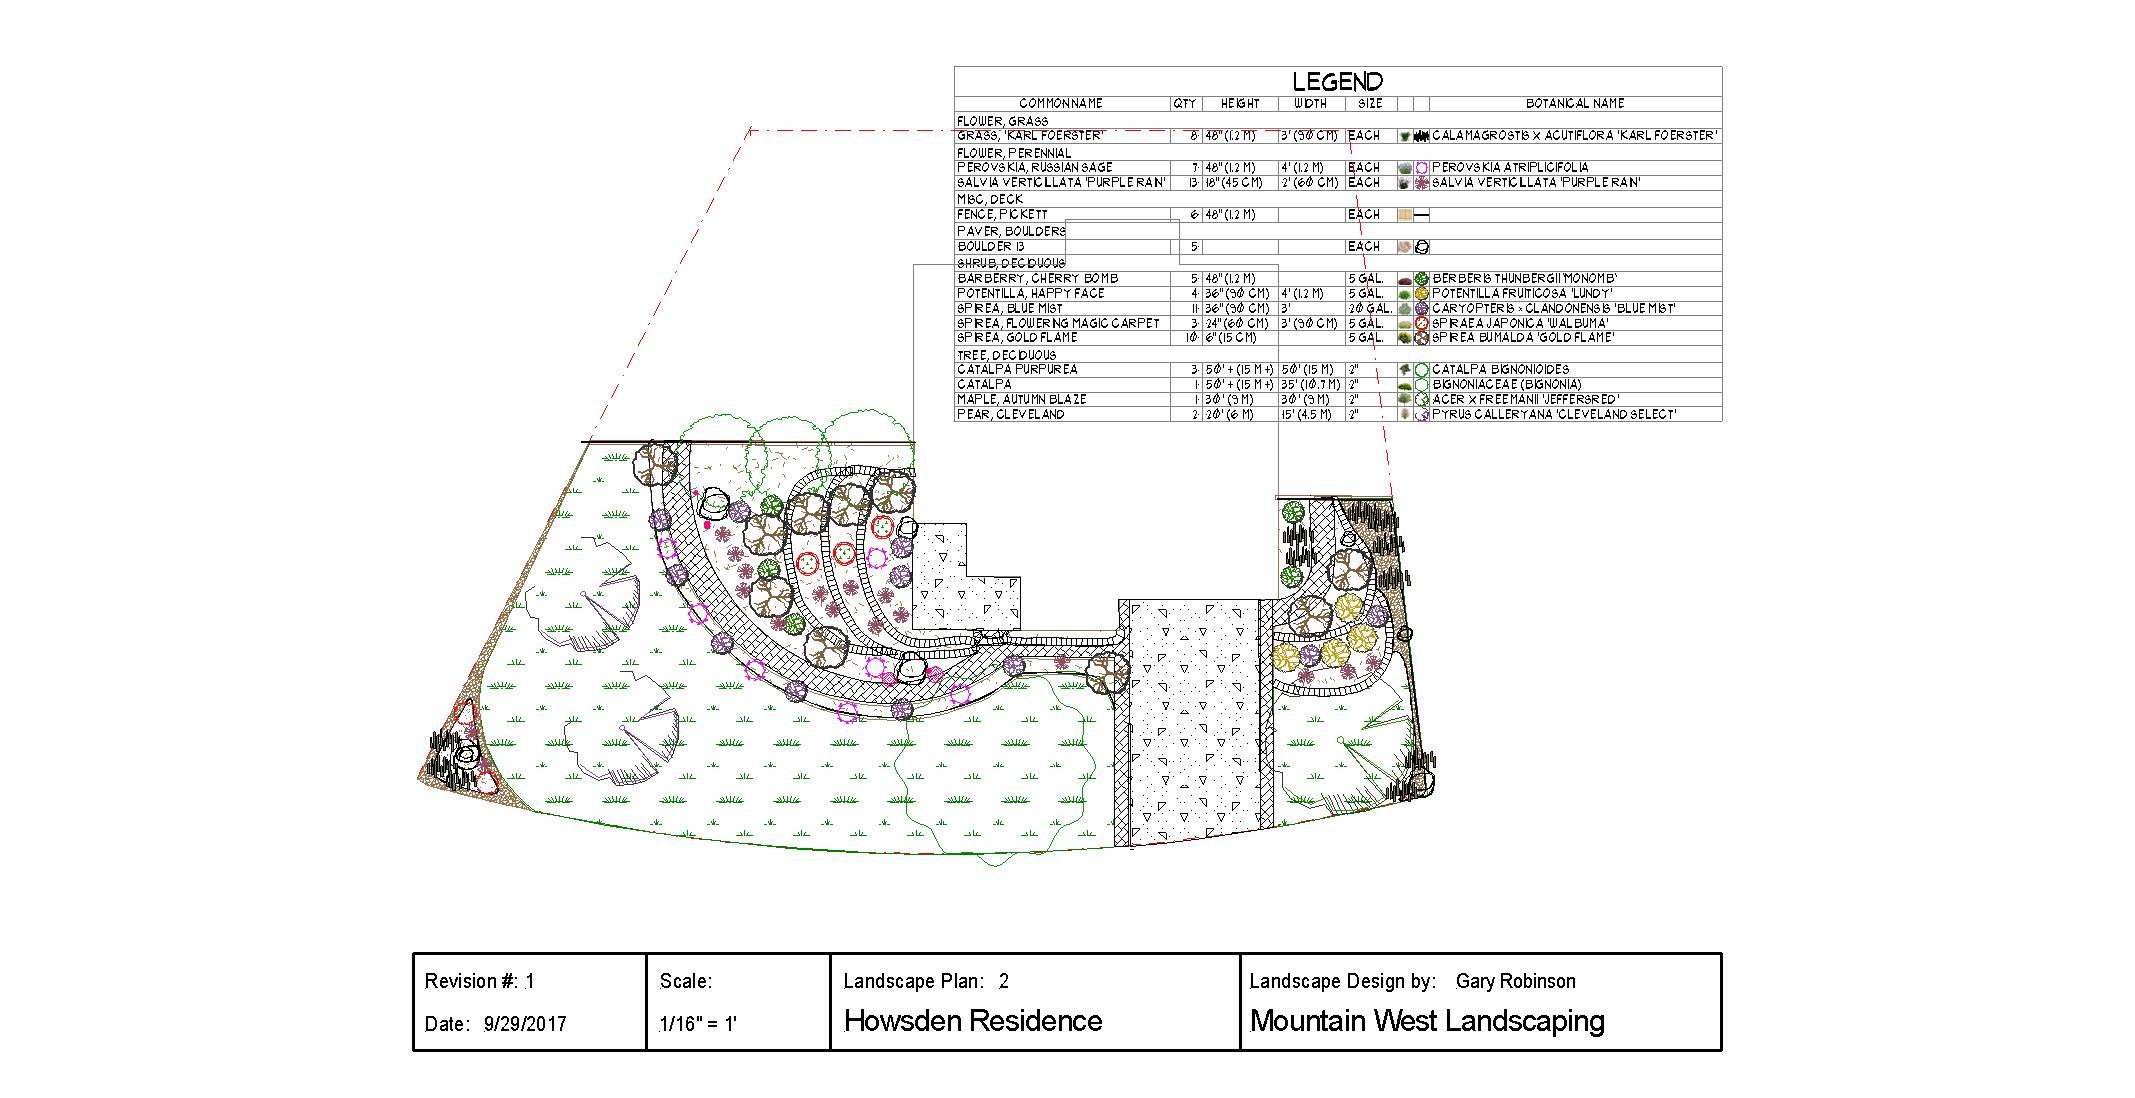 landscaping design services toward me